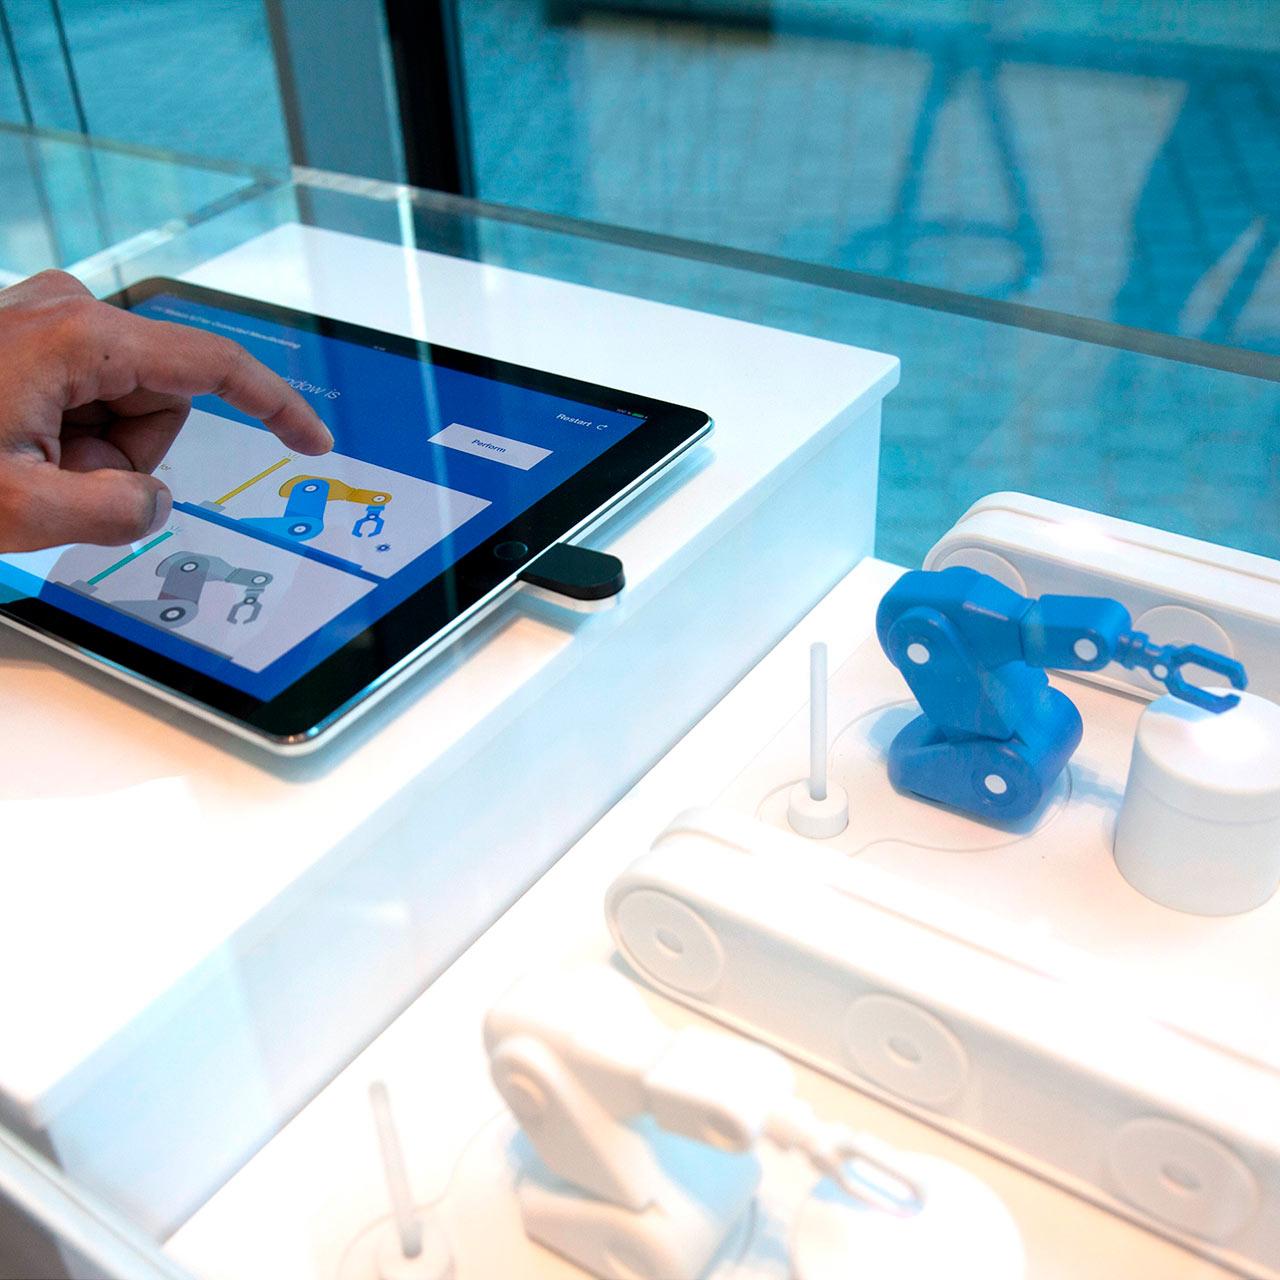 IBM Watson IoT offering demos